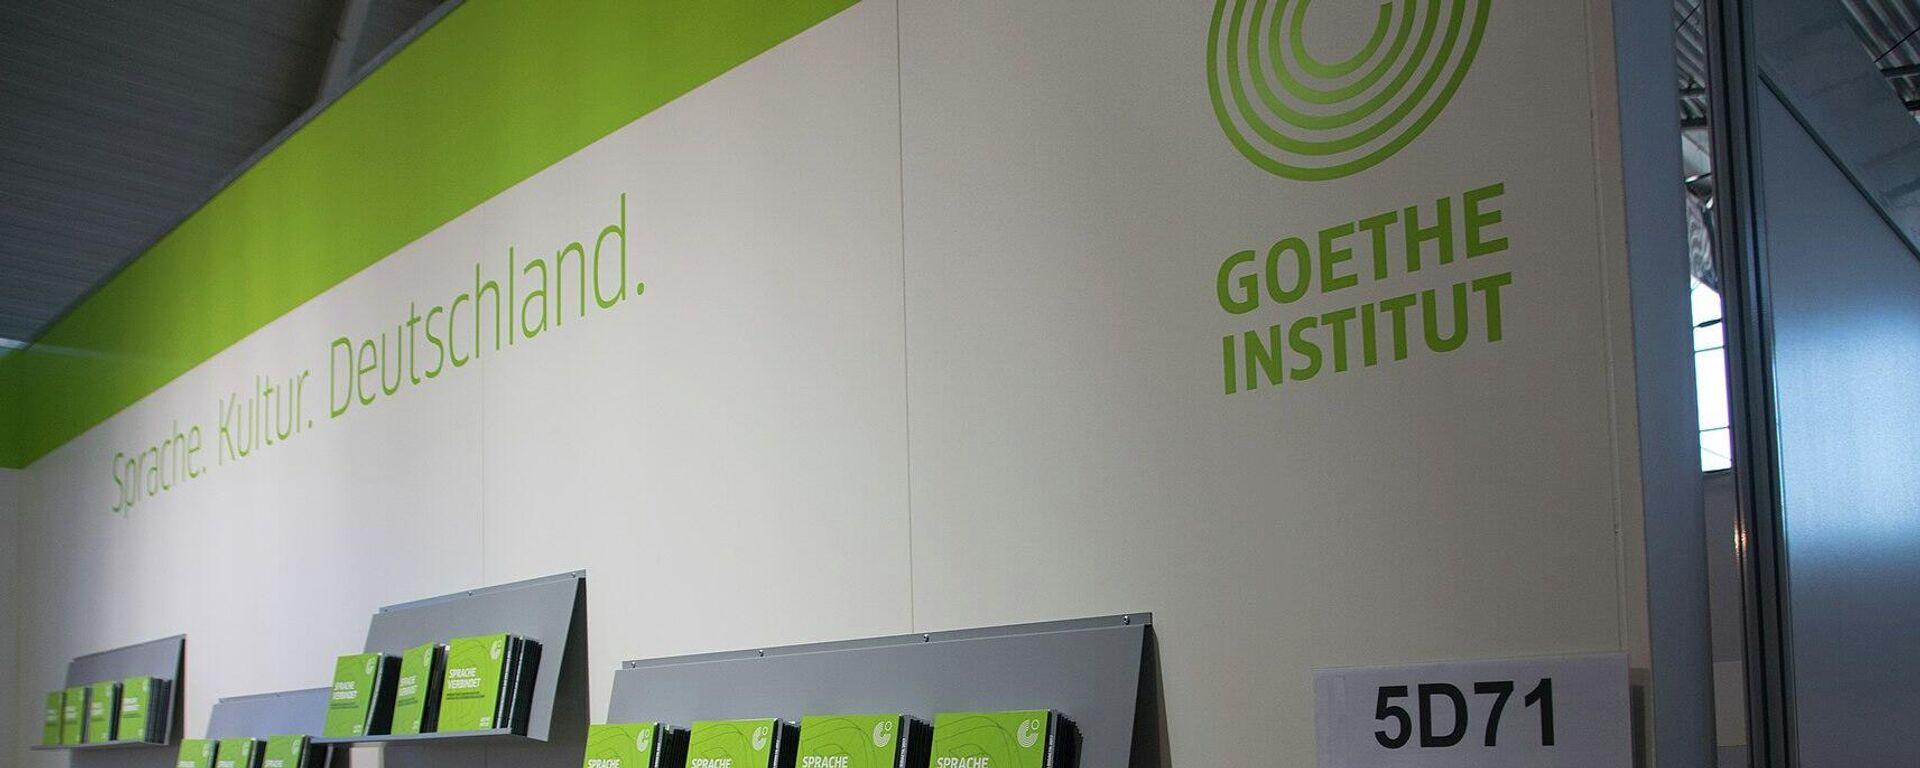 Goethe-Institut in Stuttgart (Archivbild) - SNA, 1920, 01.07.2021